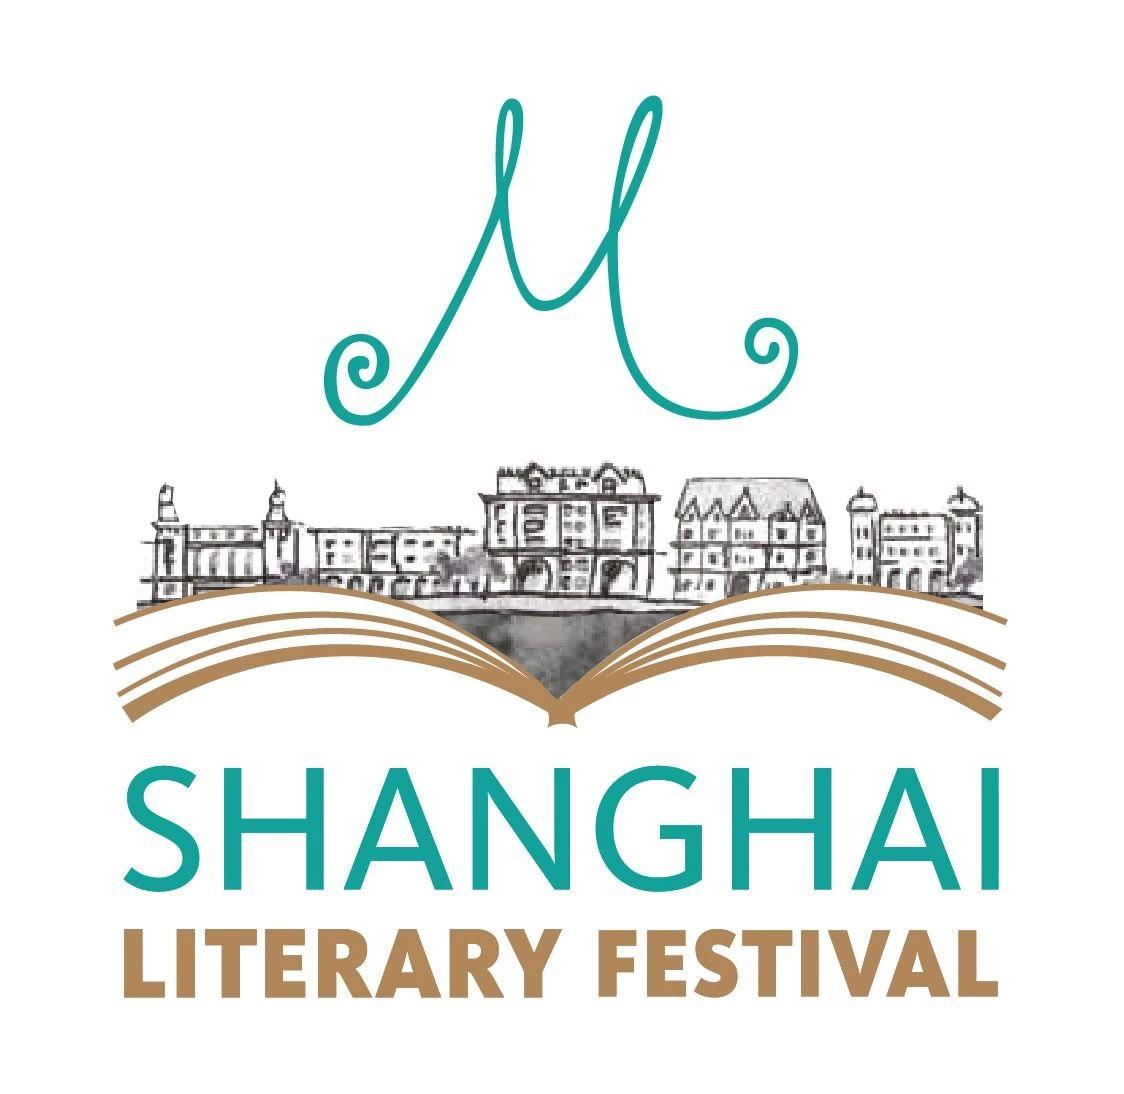 米氏文学节公告 SHANGHAI LITFEST UPDATE